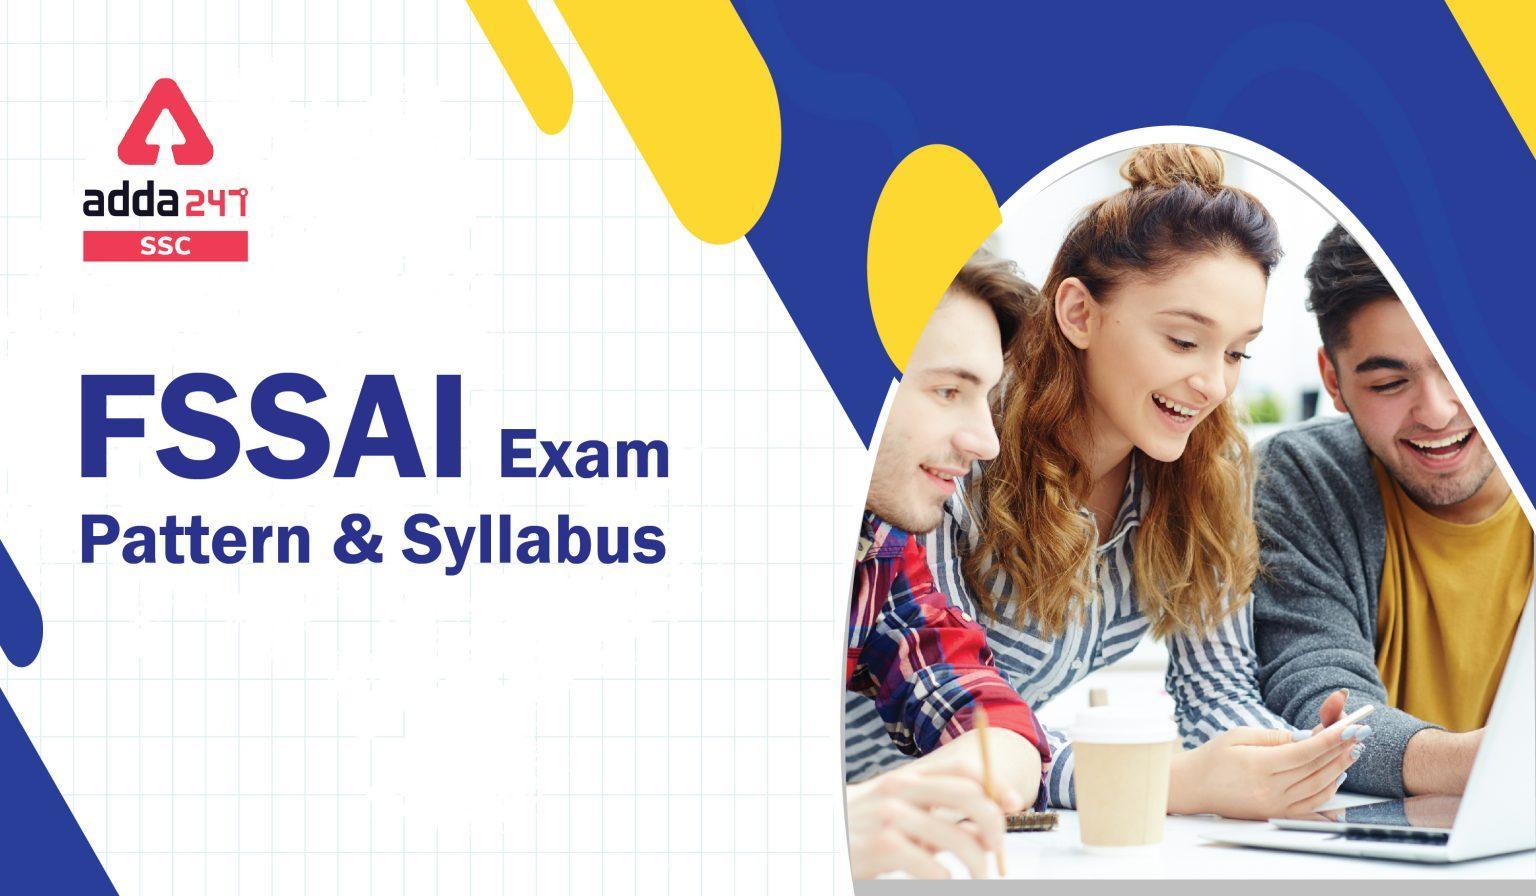 FSSAI Exam Pattern & Syllabus in Hindi : यहाँ देखें FSSAI का कम्पलीट सिलेबस और एग्जाम पैटर्न_40.1